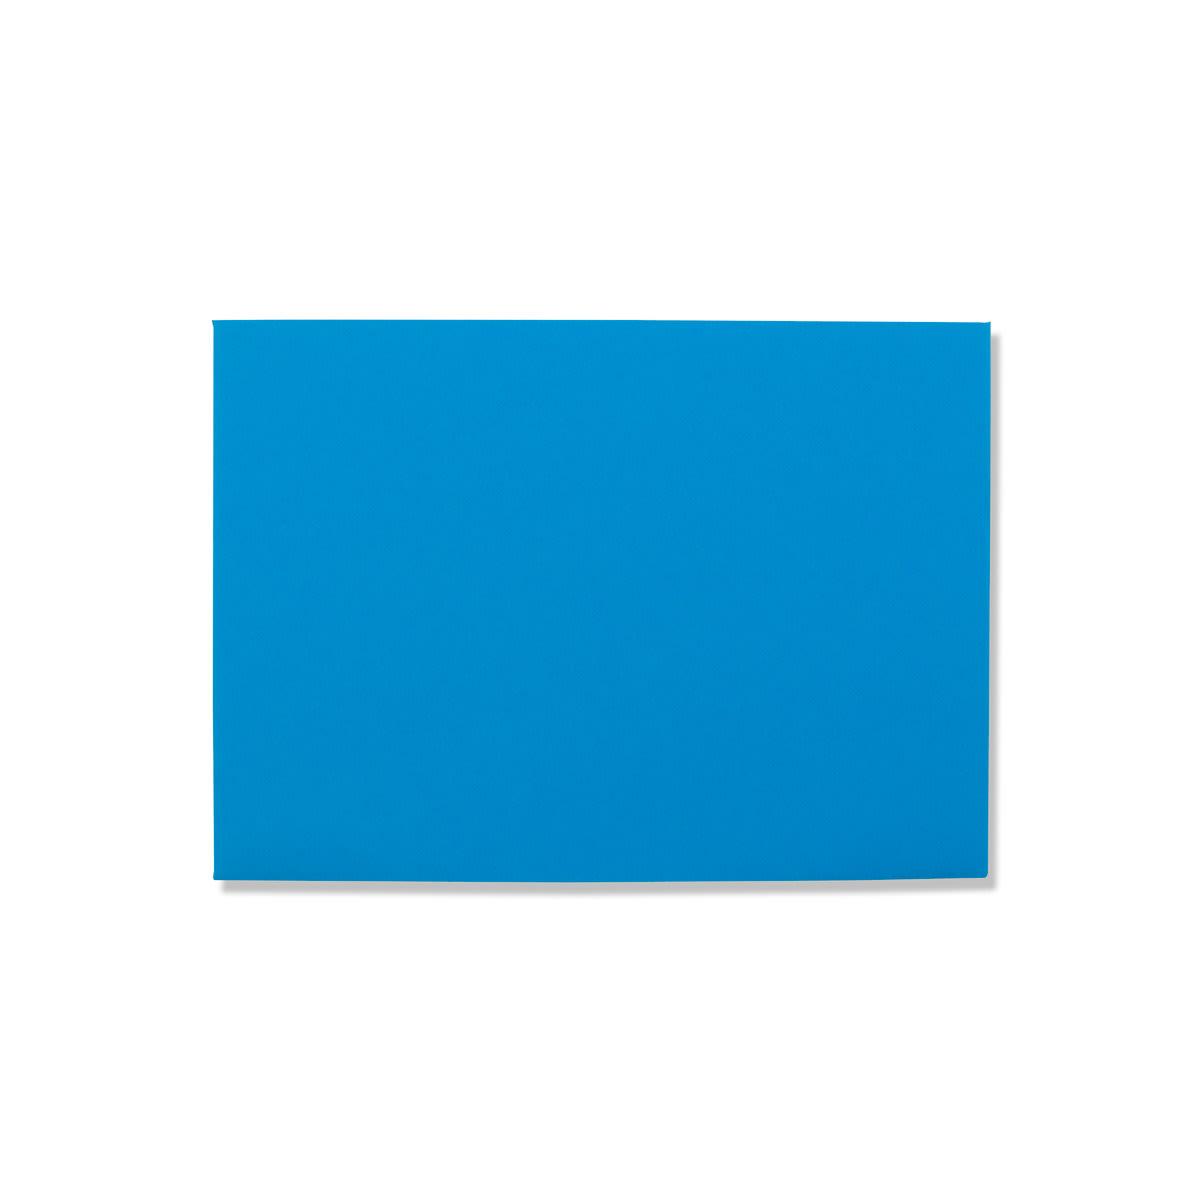 BRIGHT BLUE 125 x 175mm ENVELOPES 120GSM